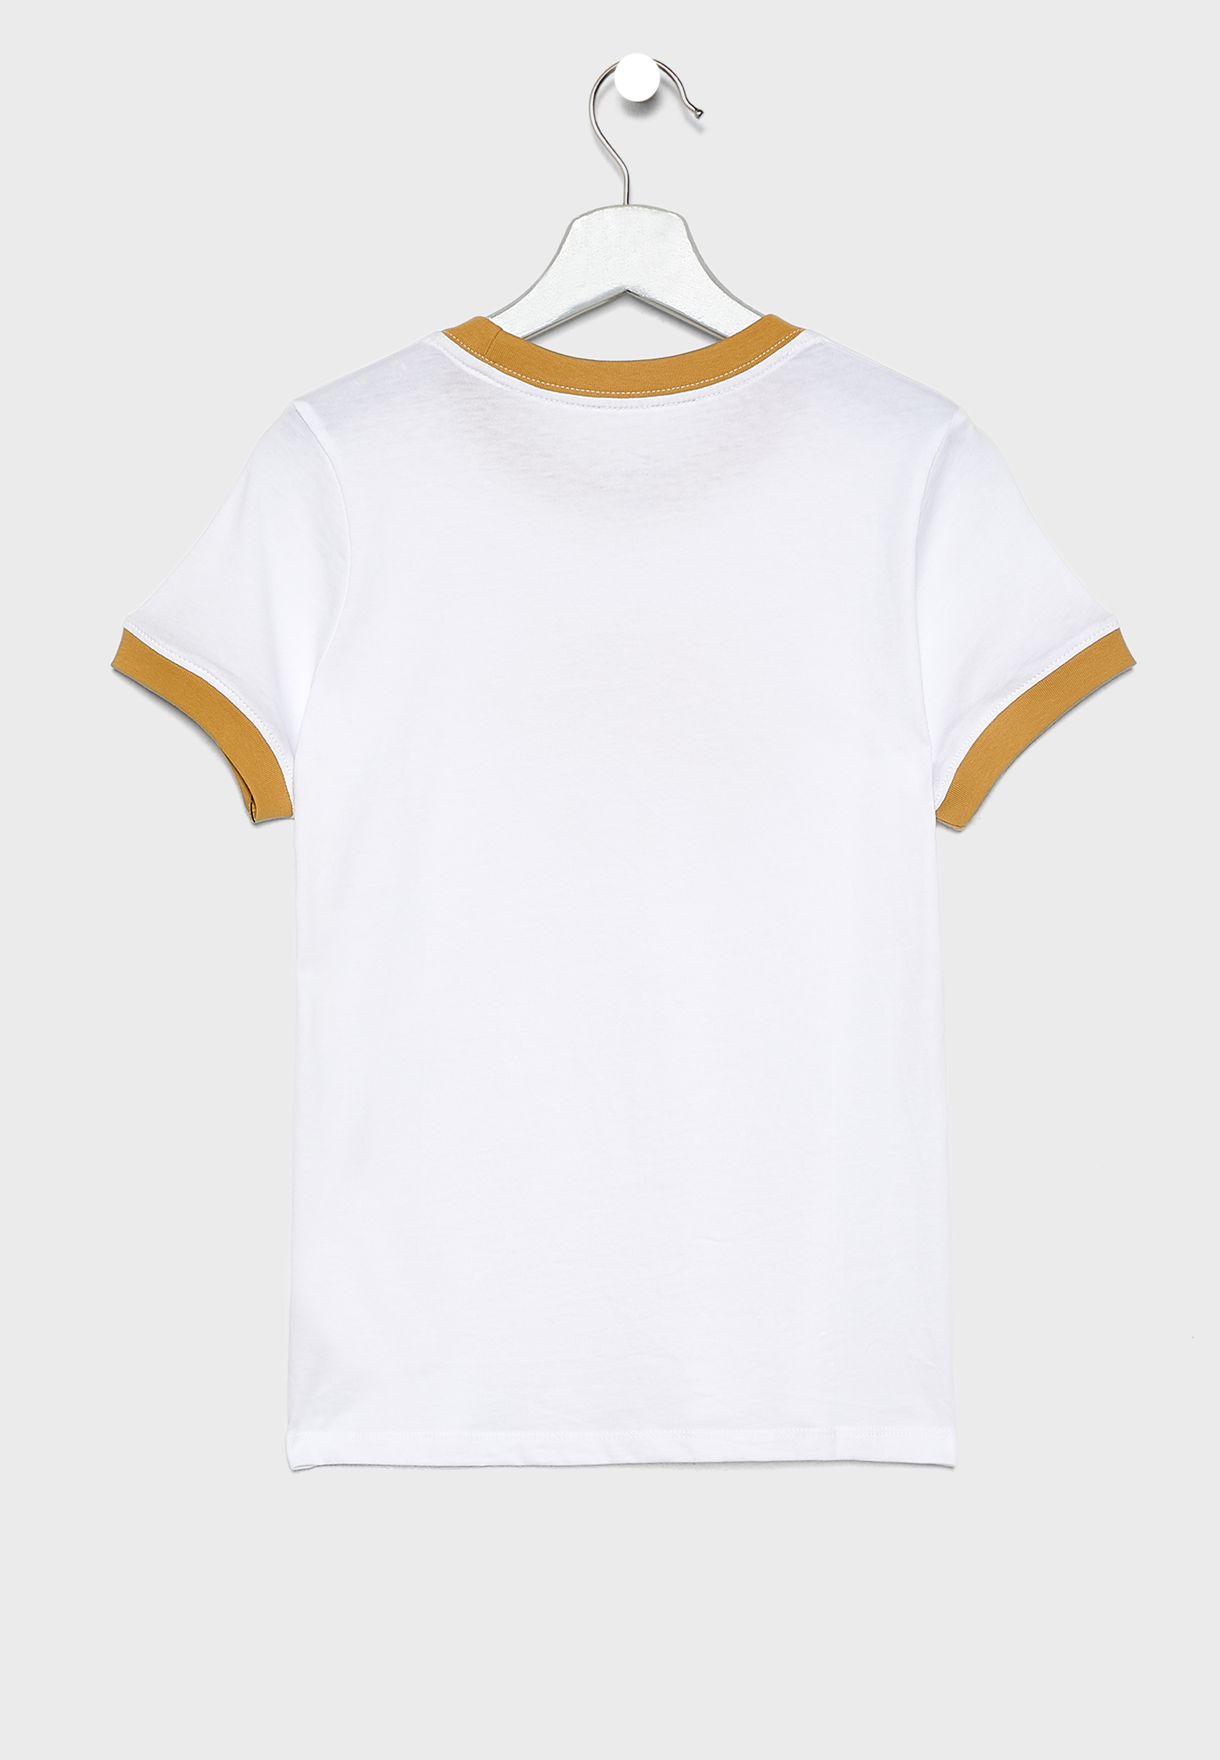 Youth NSW Air Logo Ringer T-Shirt